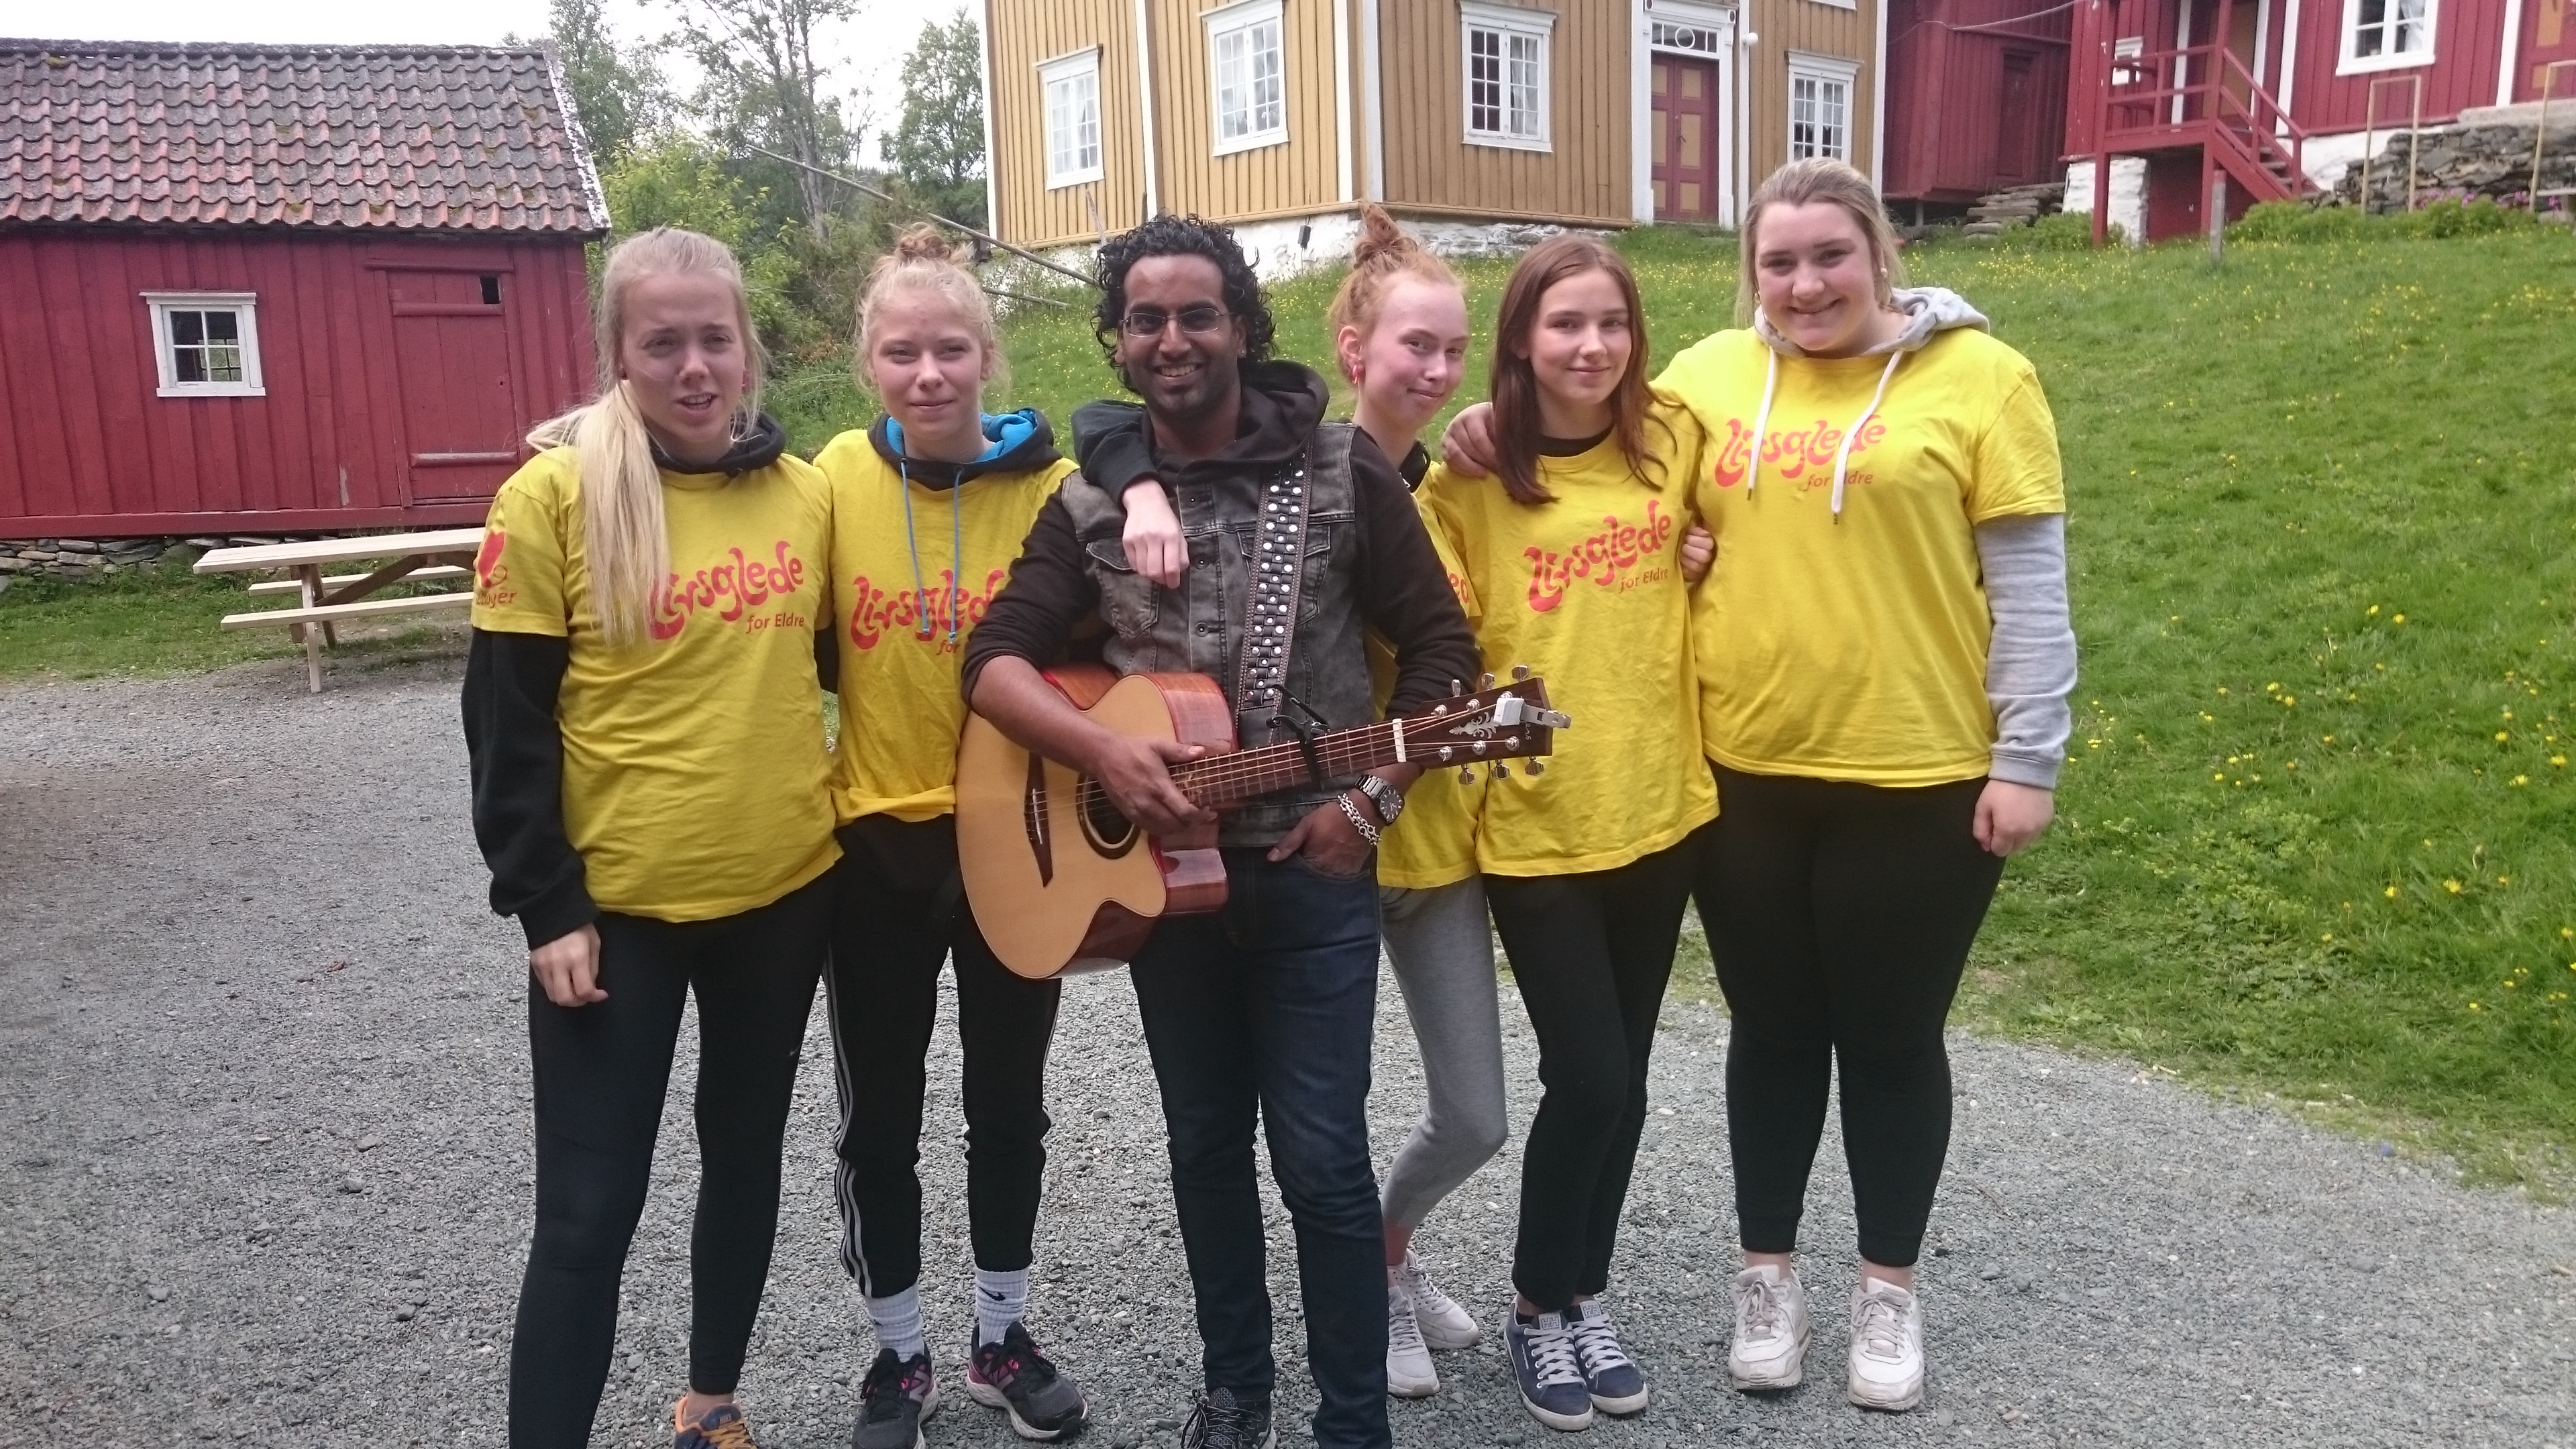 Chand Torsvik overrasket livsgledeelever fra helse- og oppvekstfag på Byåsen videregående skole i Bymarka